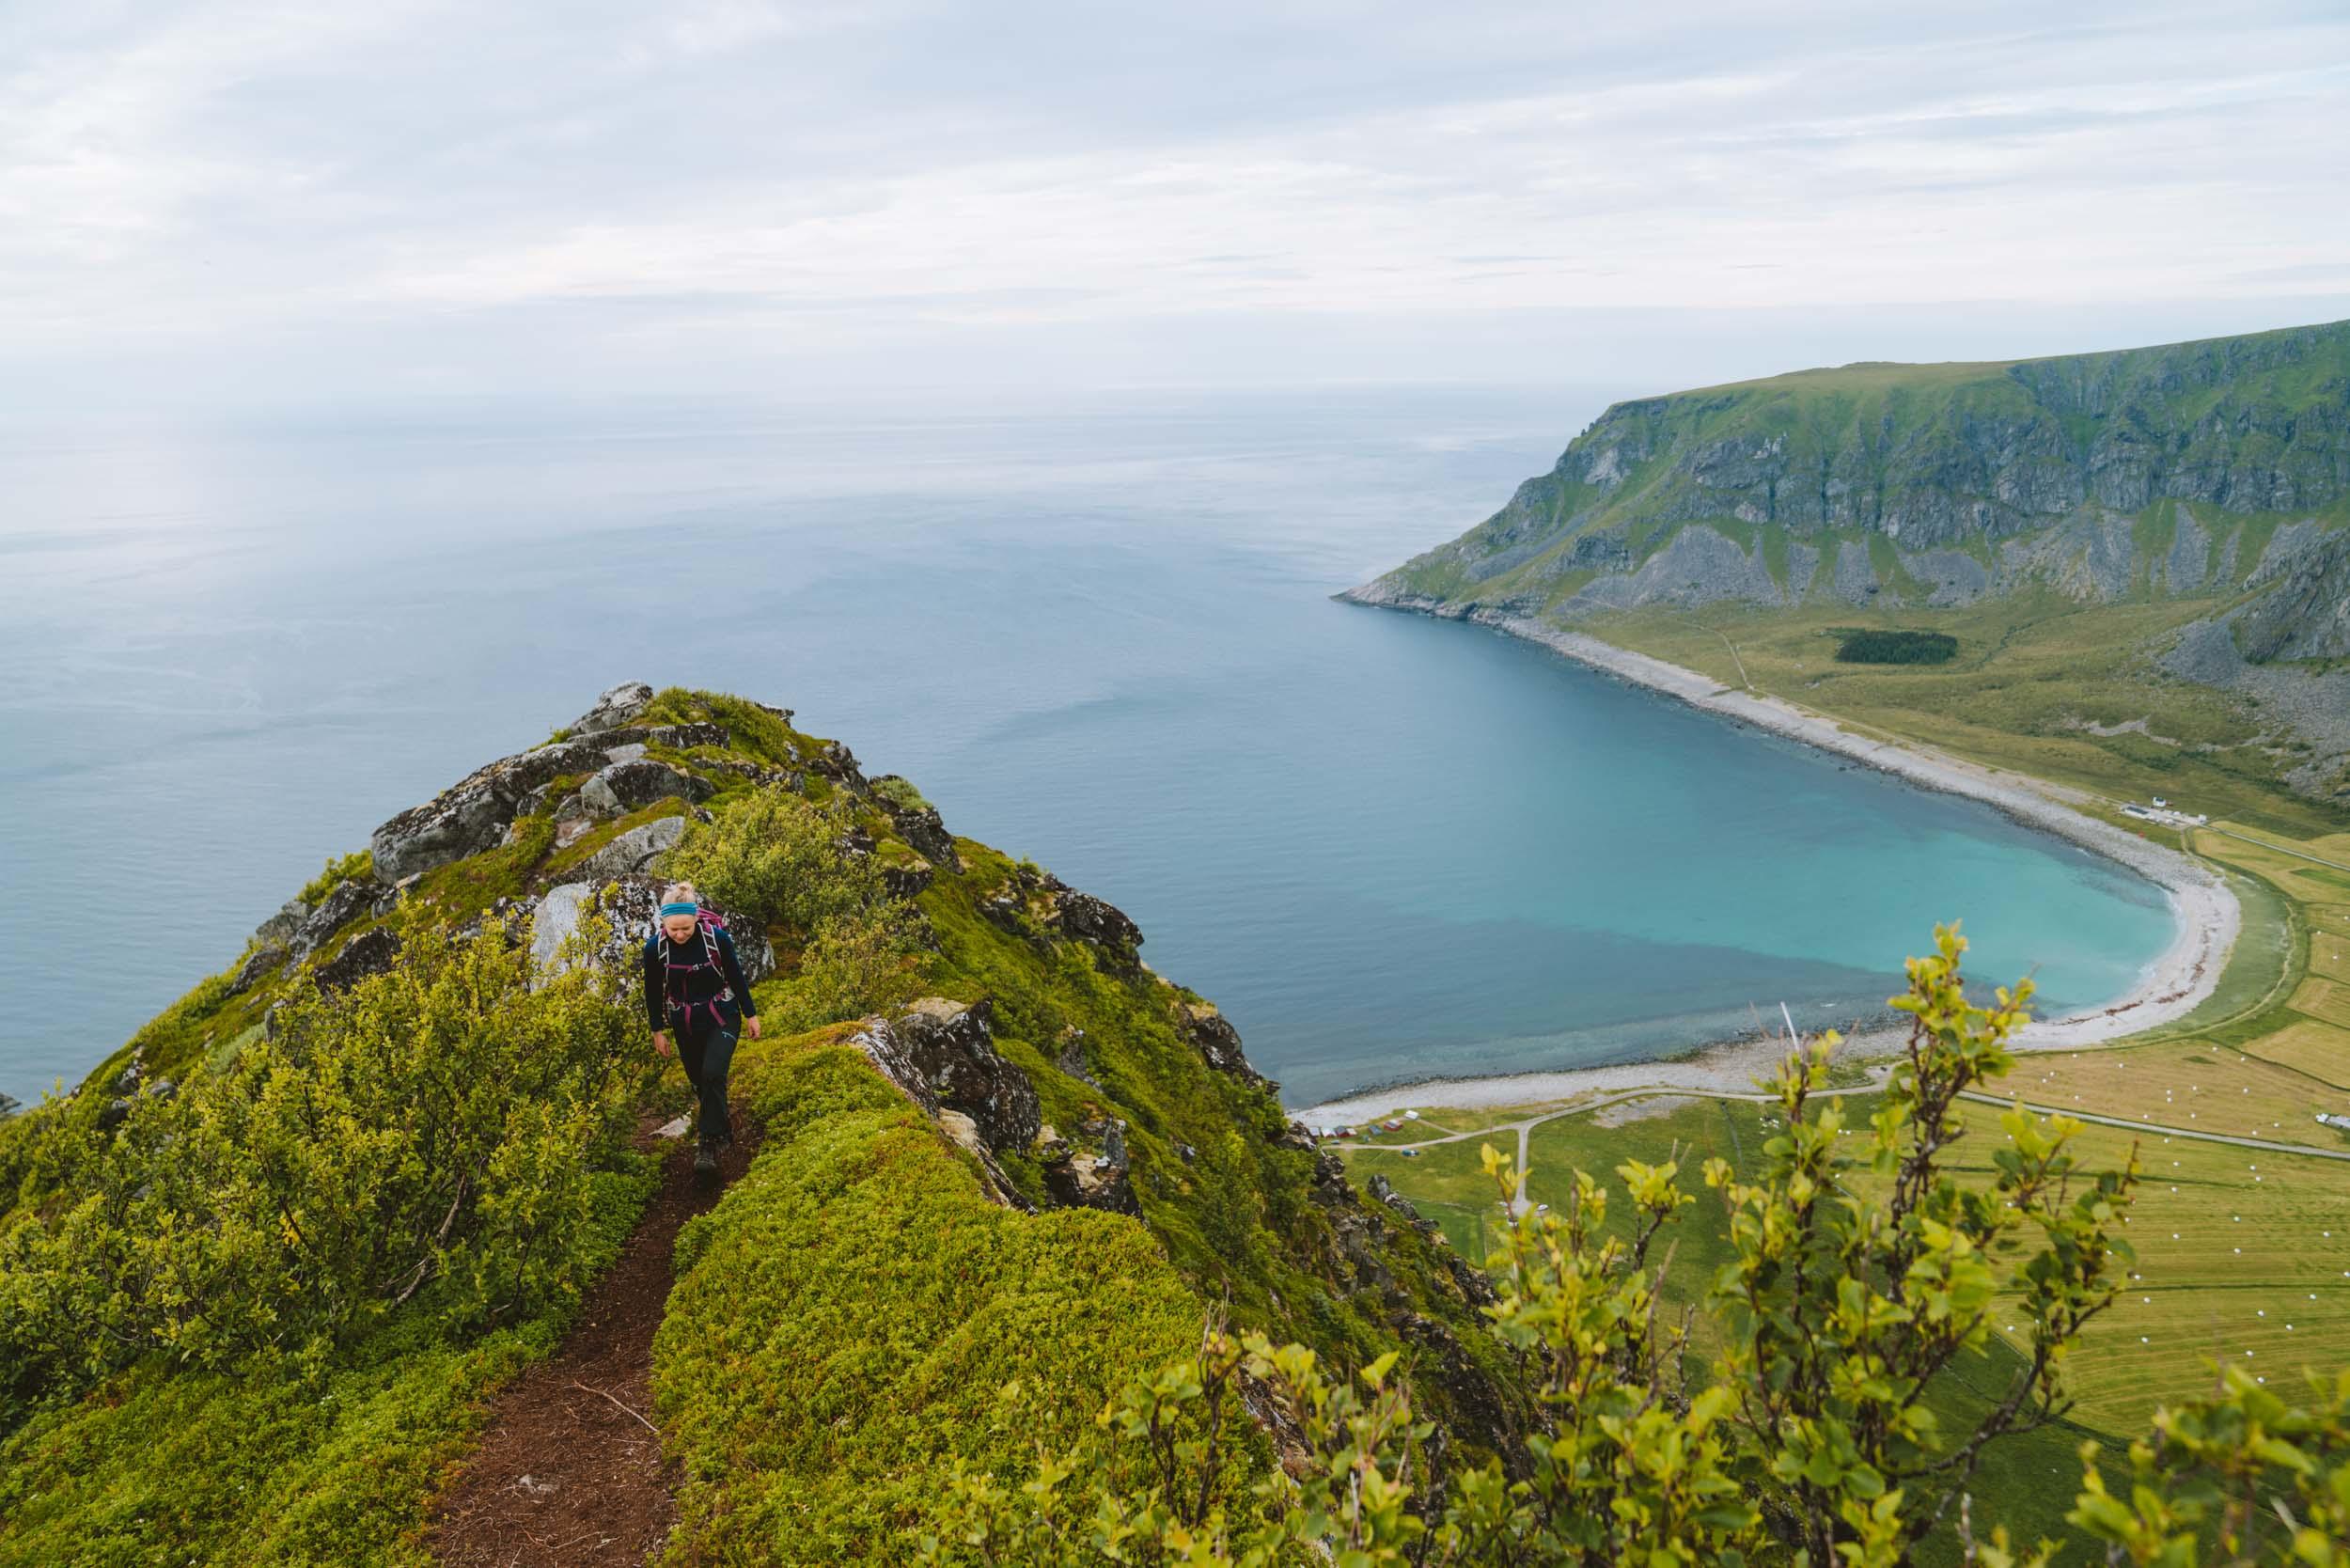 Aksla-Unstad-Lofoten.jpg